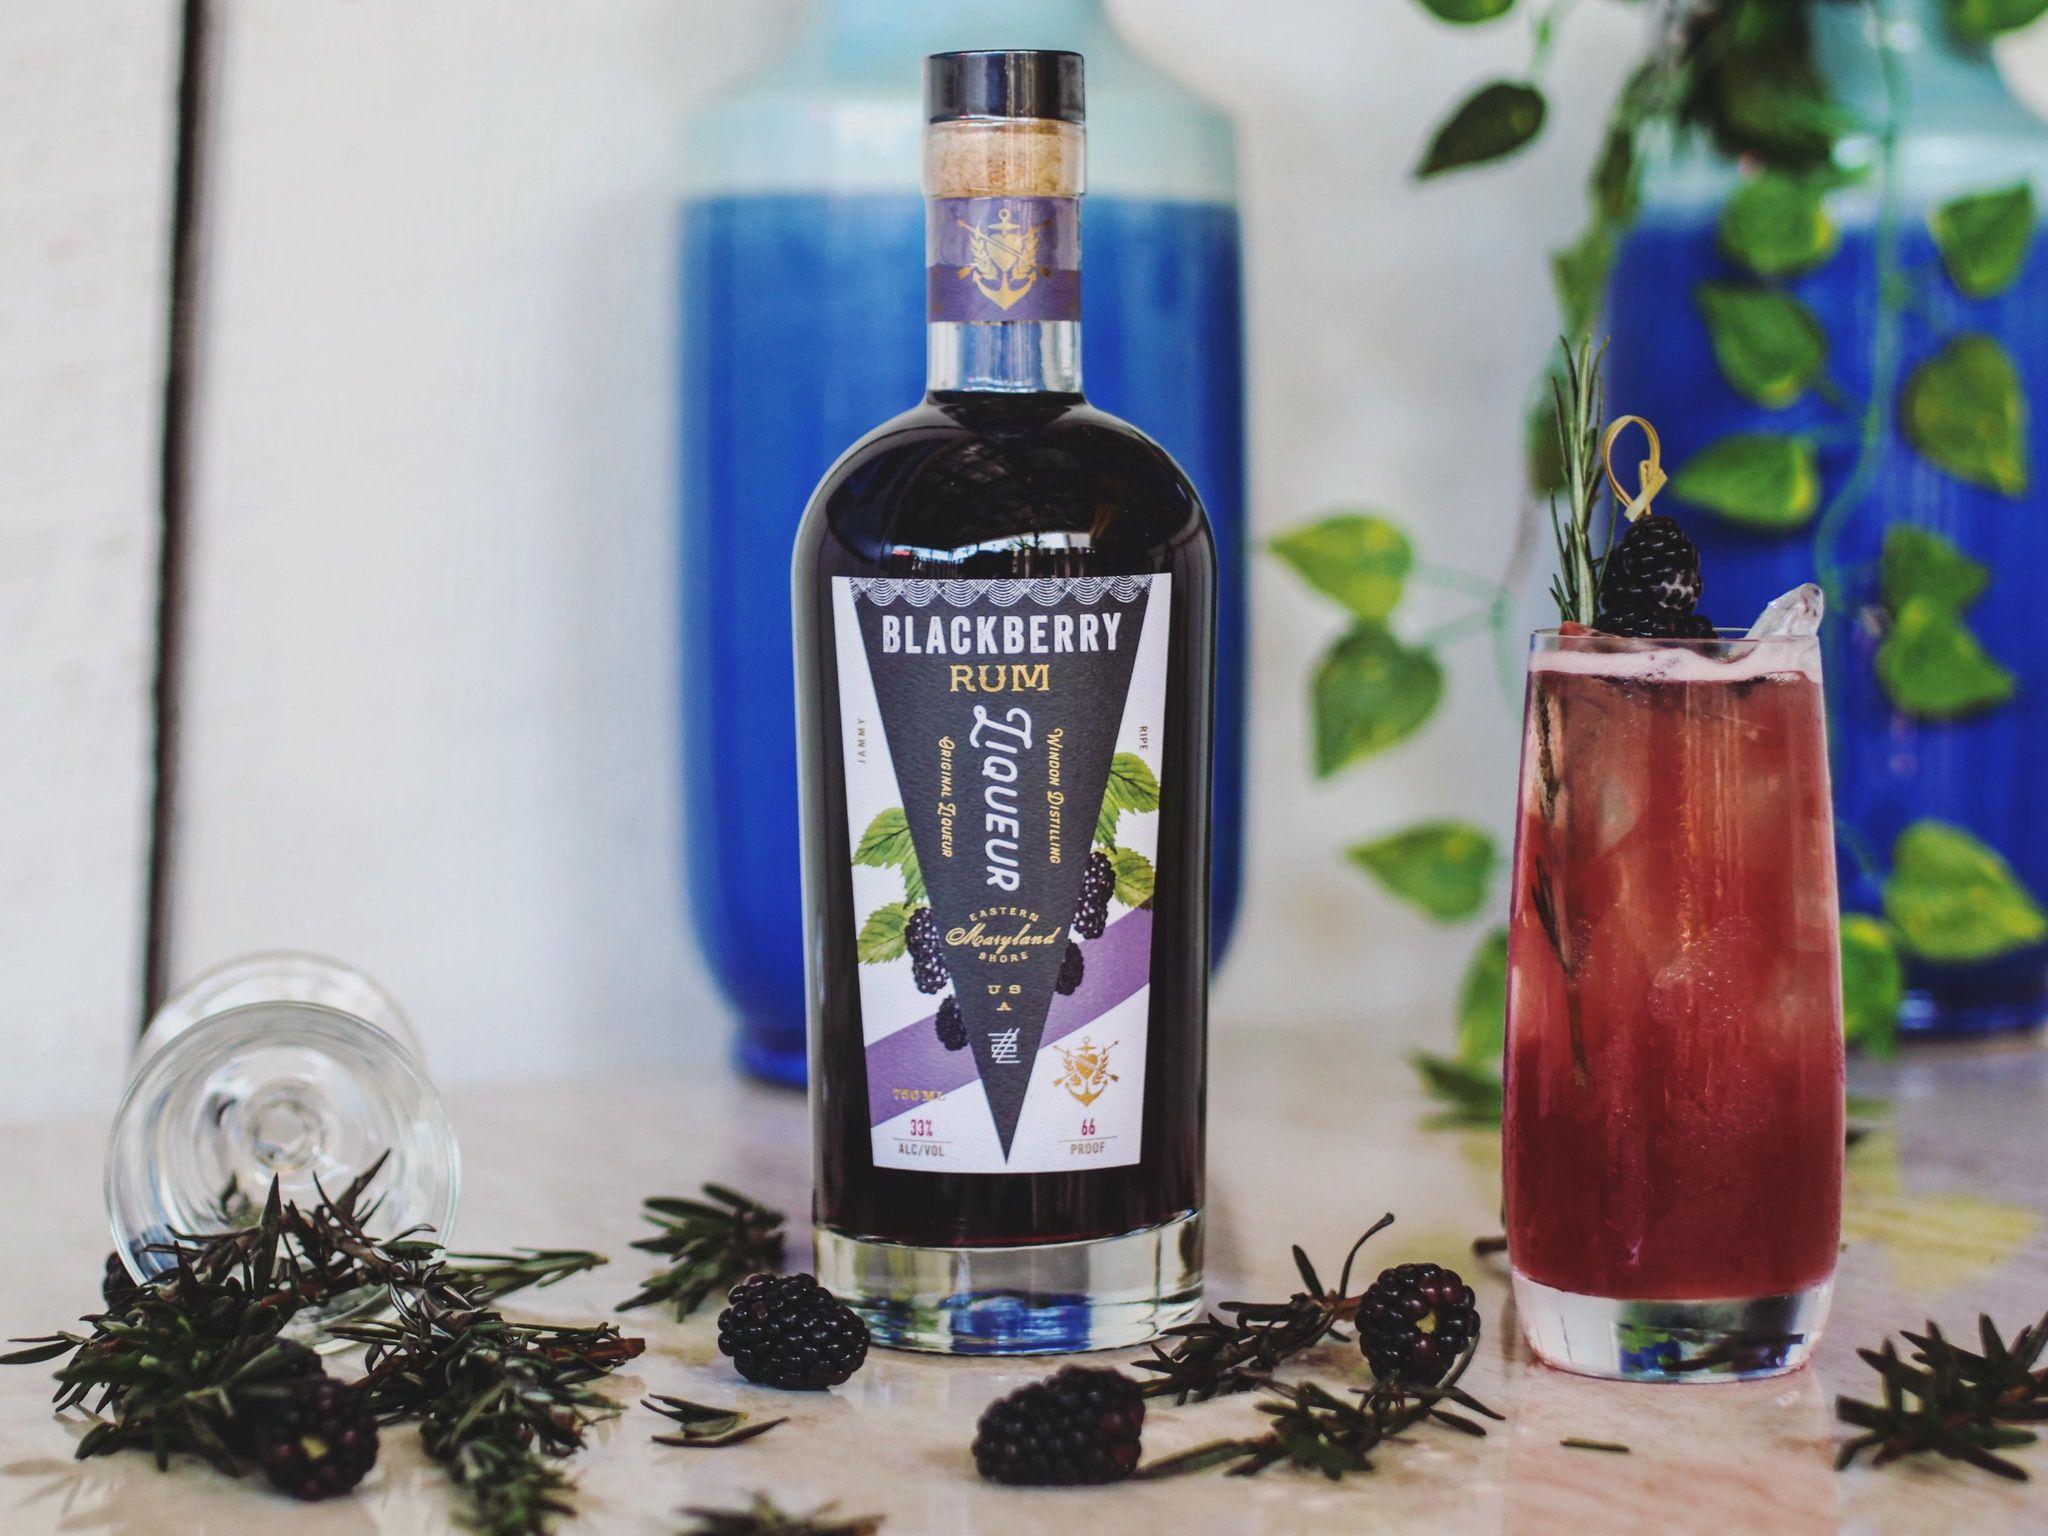 Blackberry Rum Release Event! @ Emily's Produce